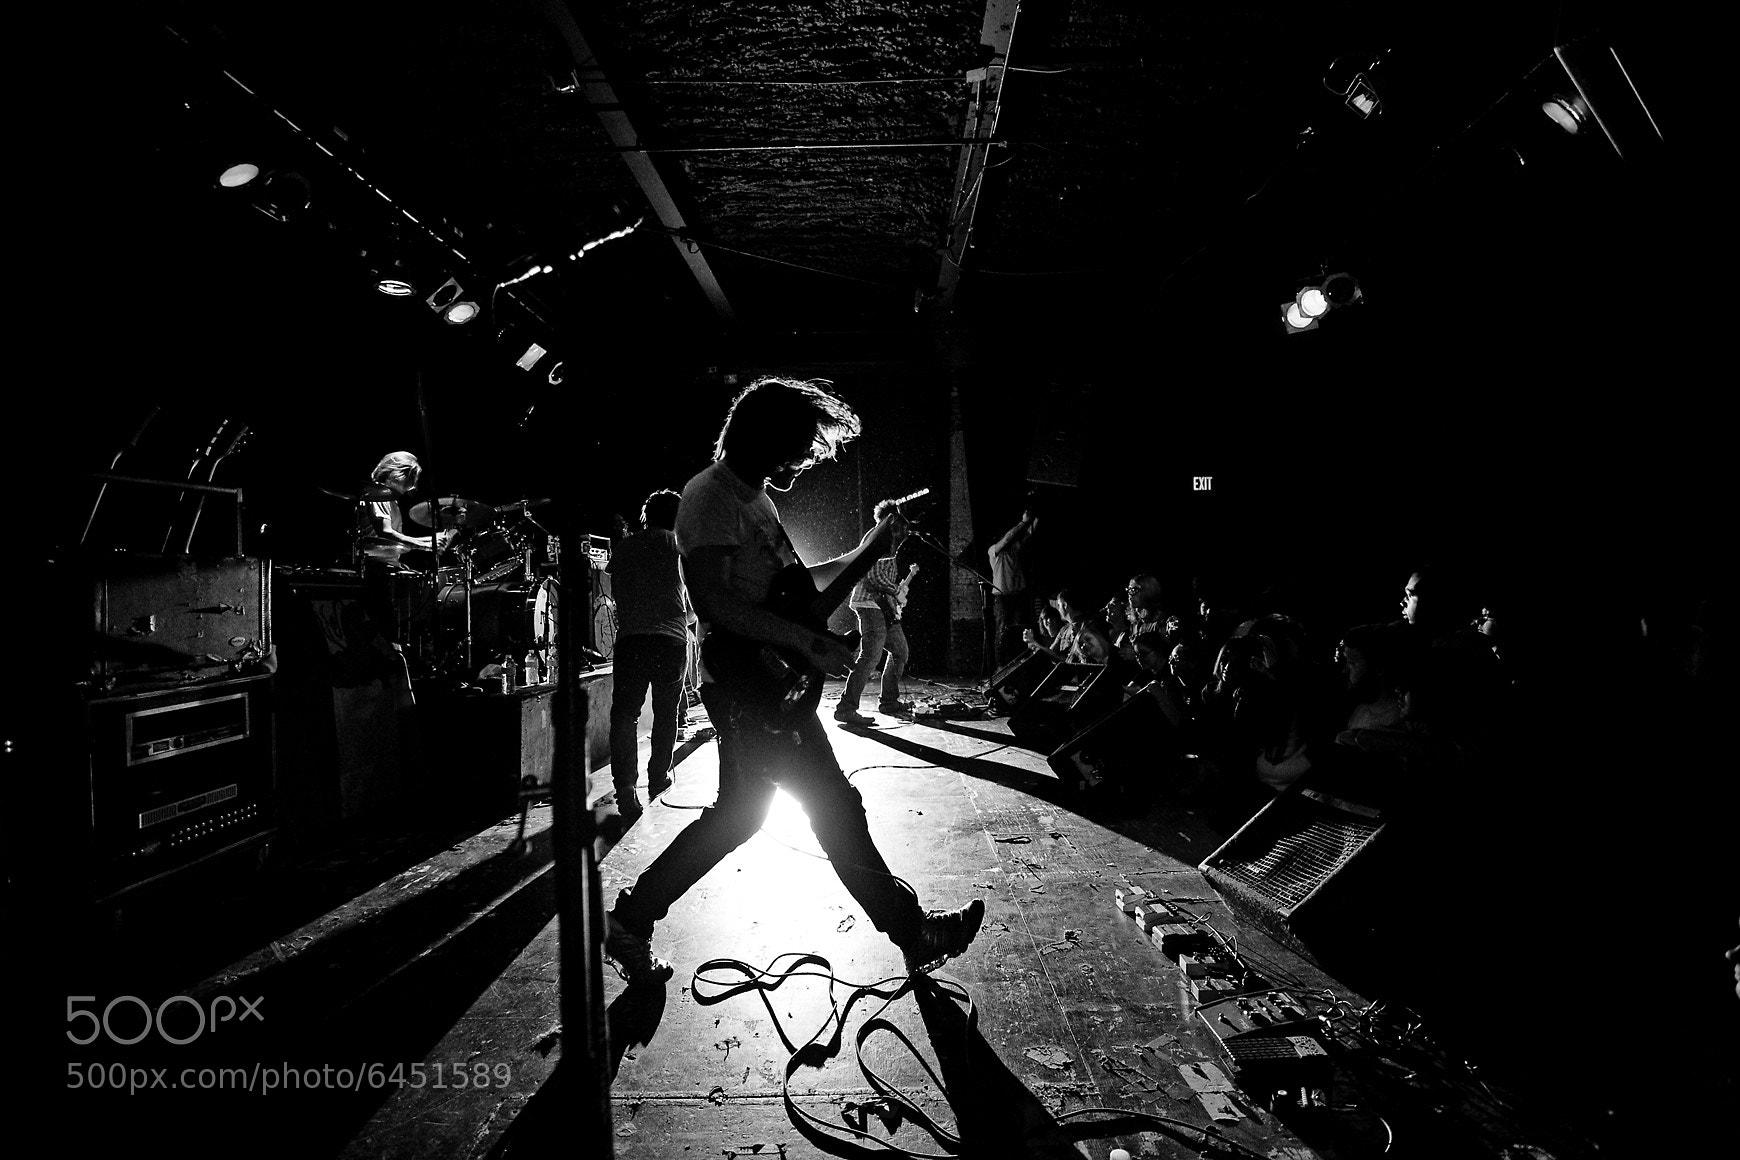 Photograph Dance Gavin Dance by Adam Elmakias on 500px